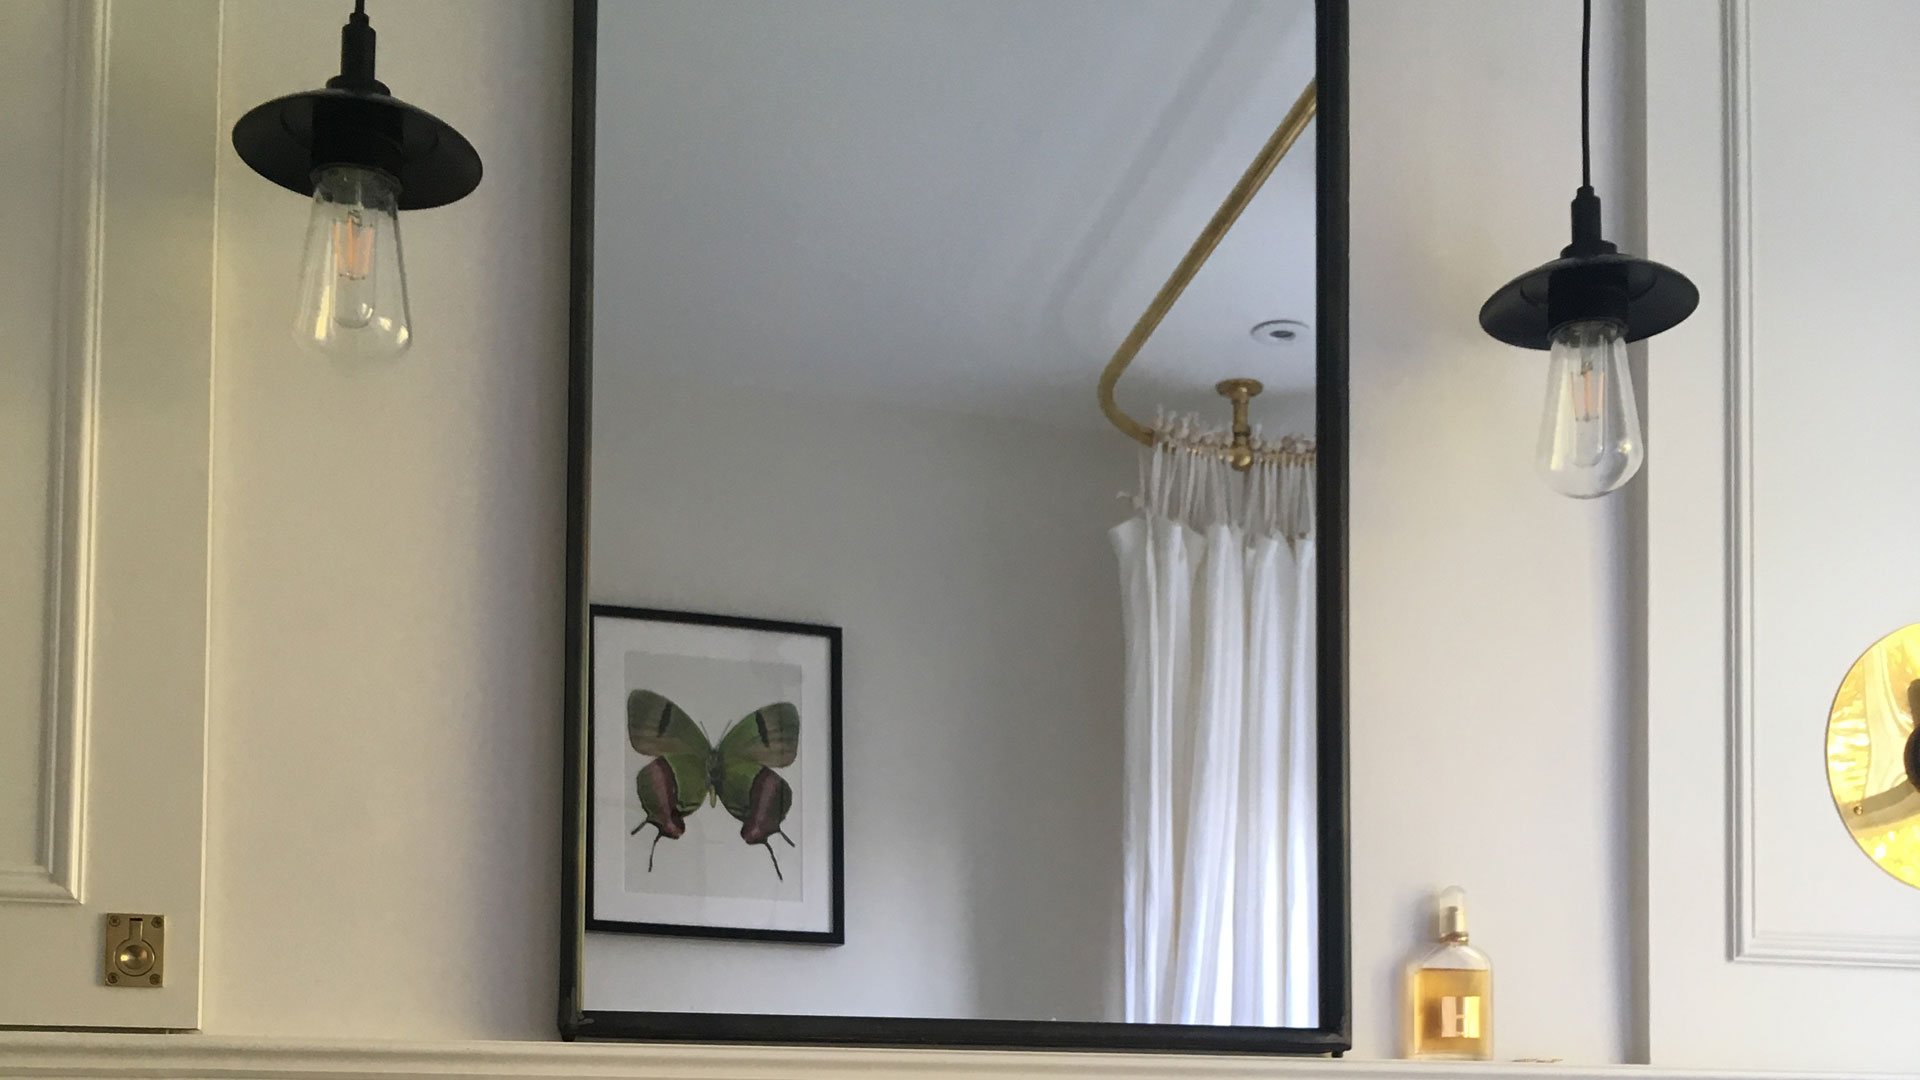 Our Ren pendants capture the vintage flair of this London bathroom